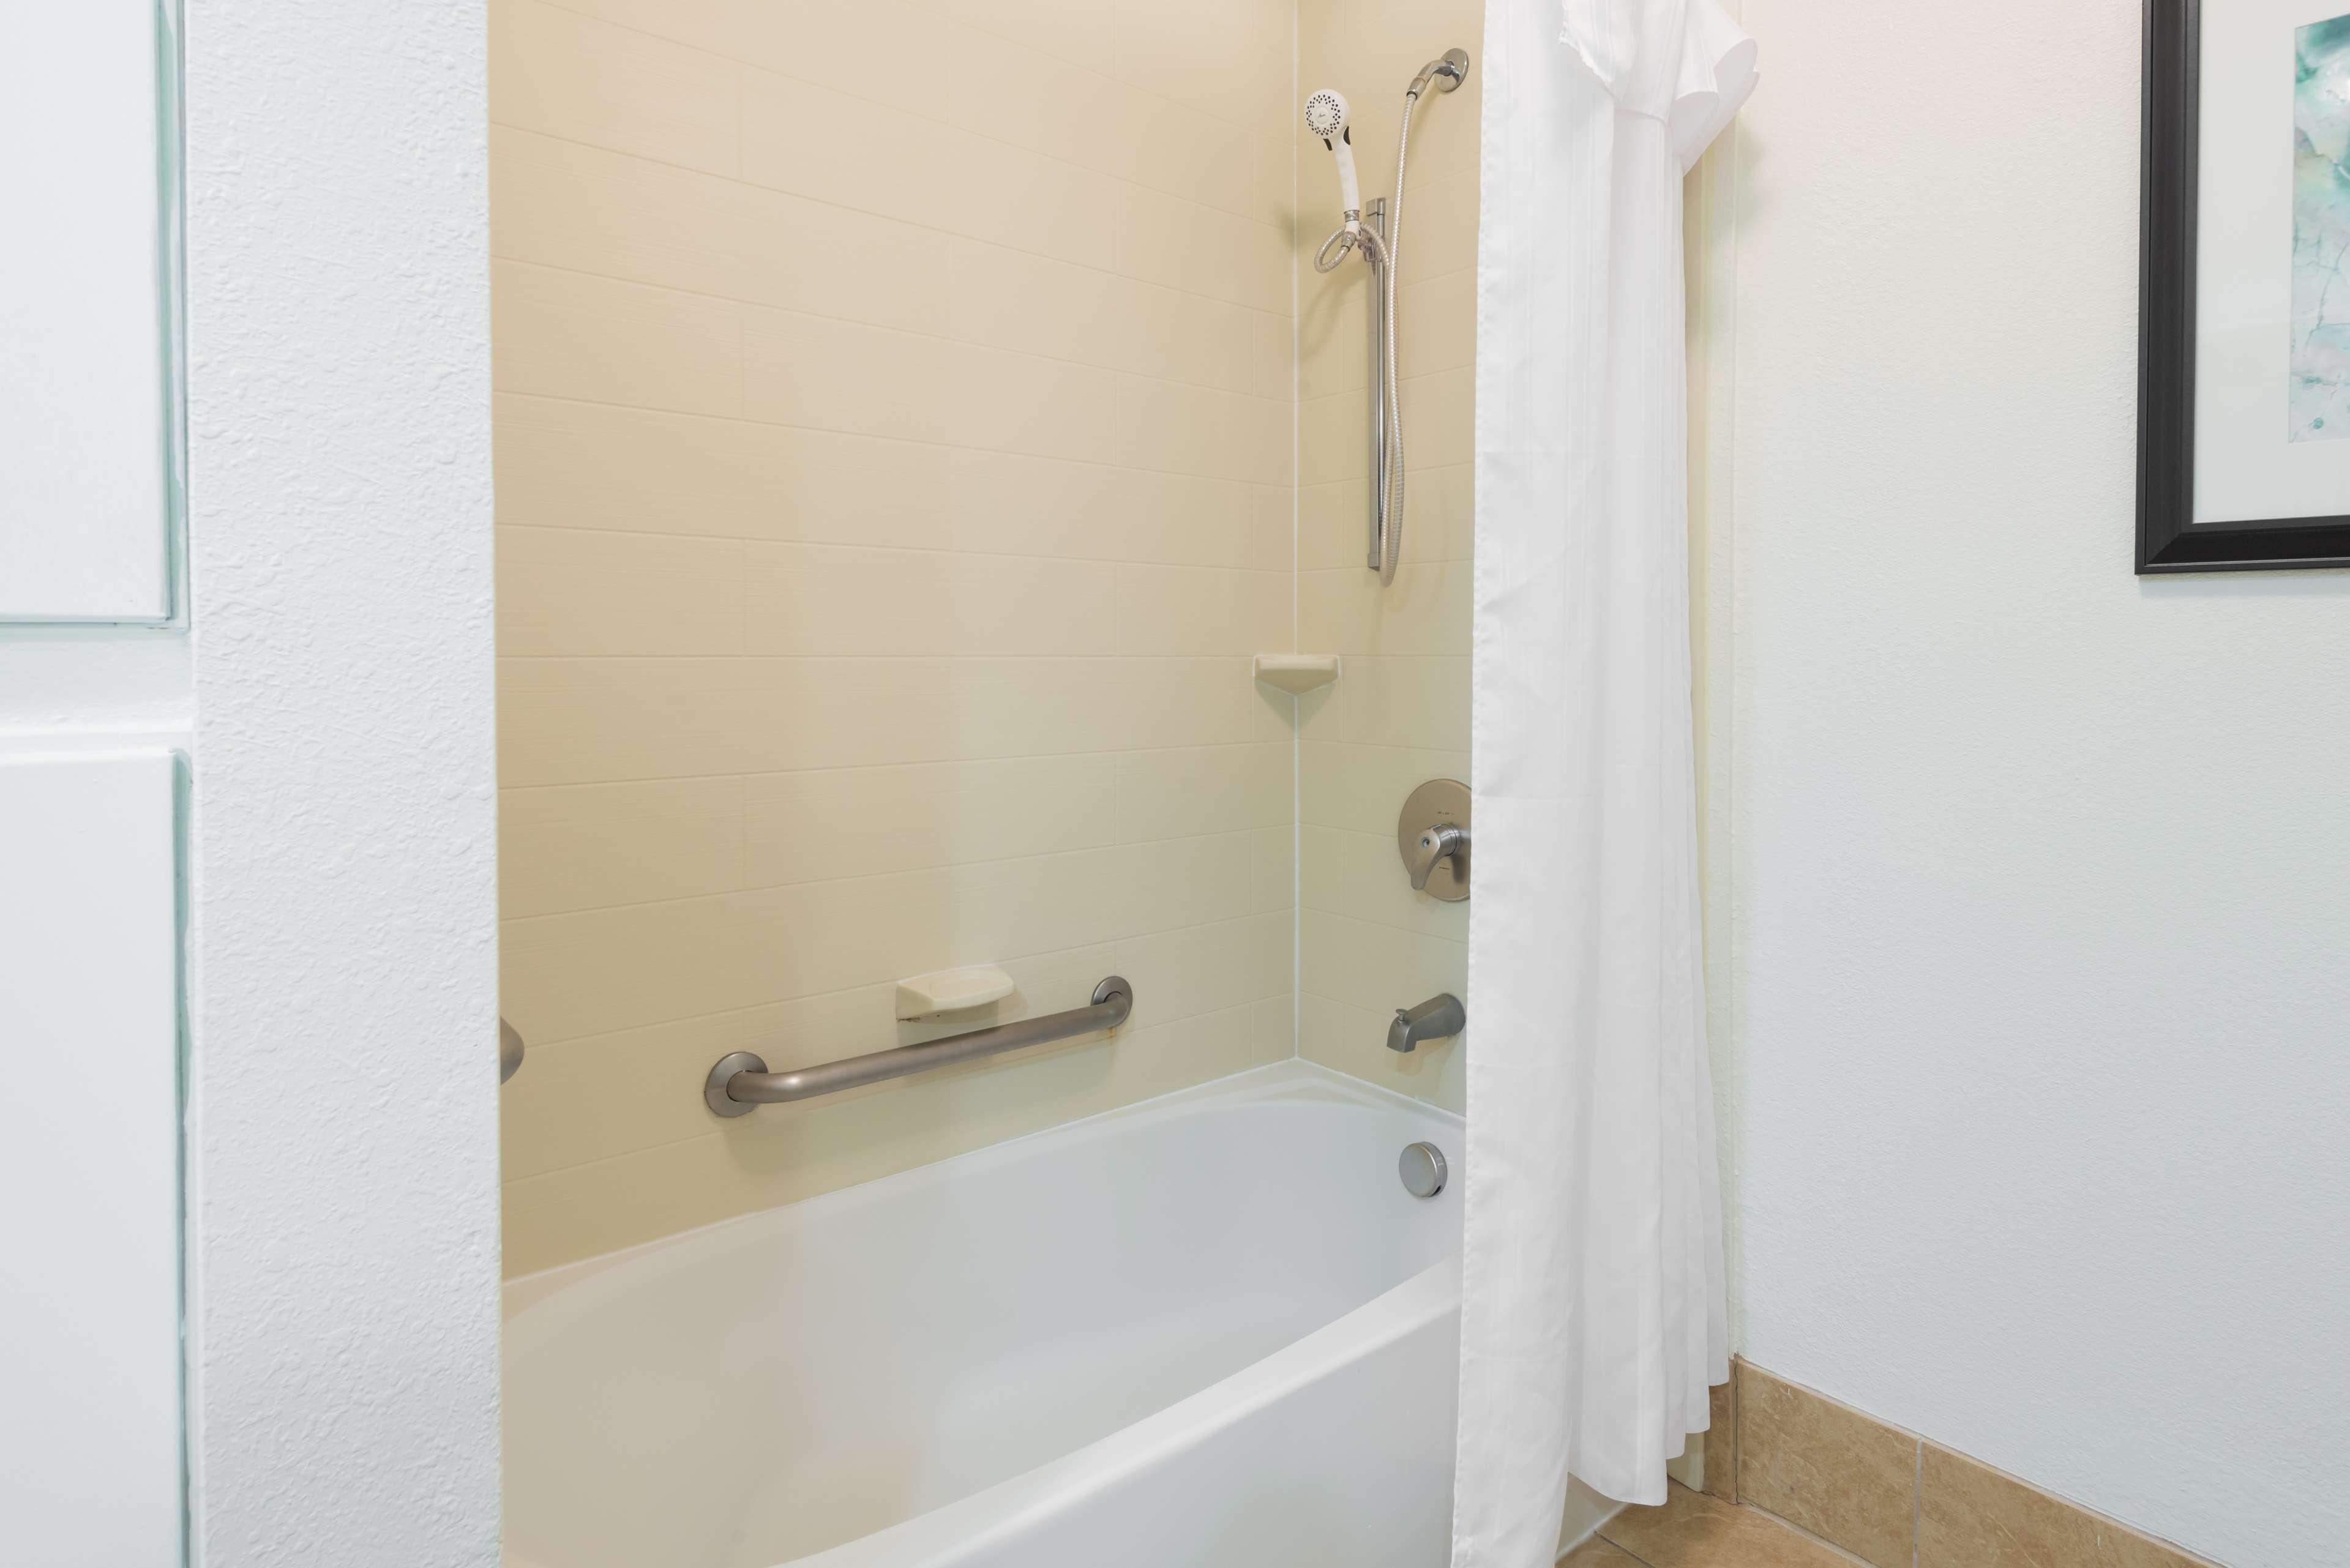 Homewood Suites by Hilton Charlotte-North/Univ Research Park image 15